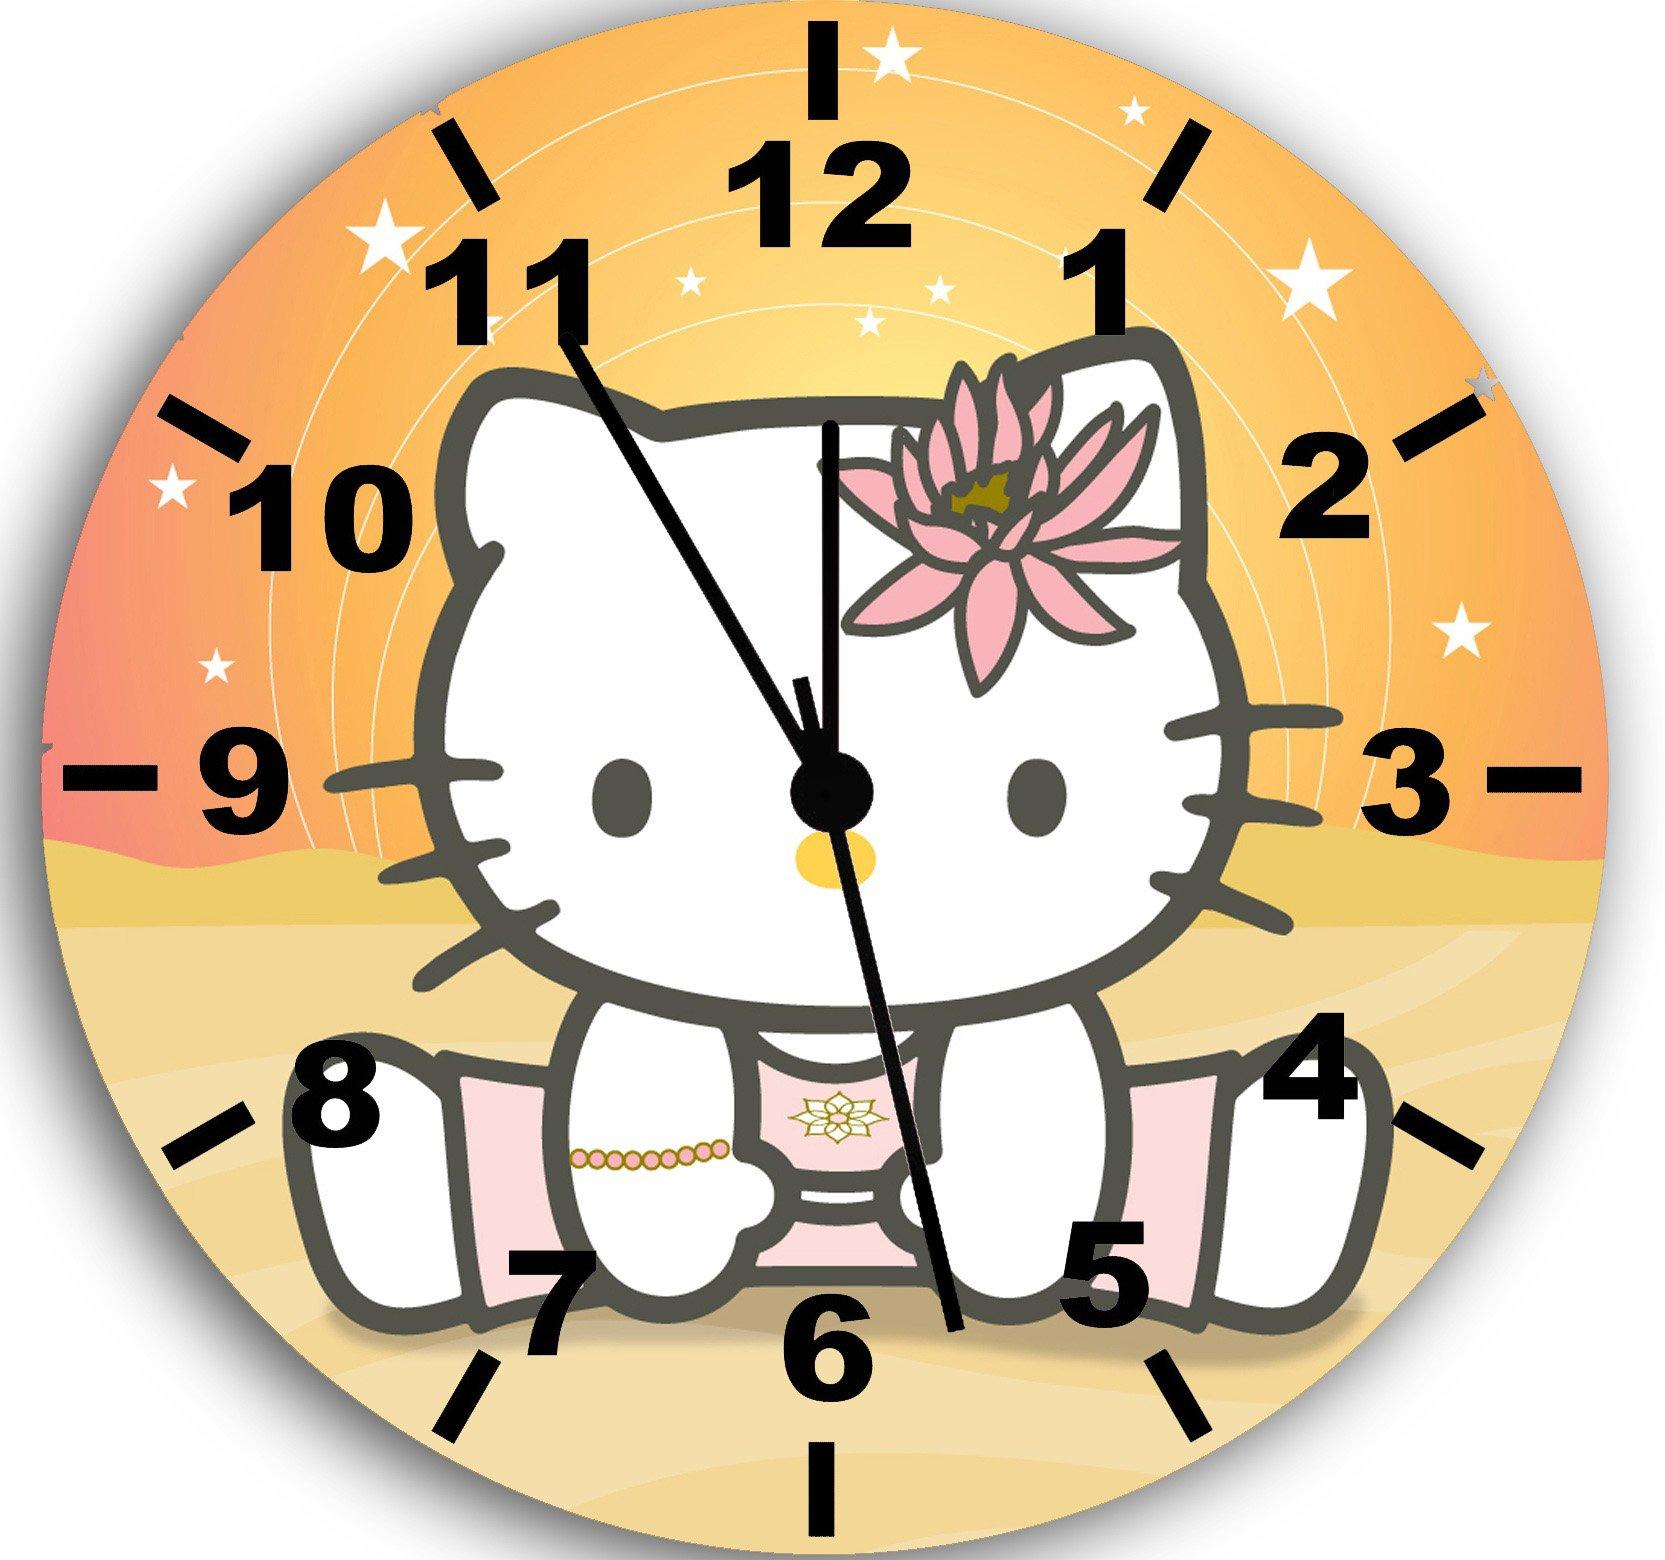 Hello Kitty Yoga Frameless Borderless Wall Clock W07 Nice For Gift or Room Wall Decor